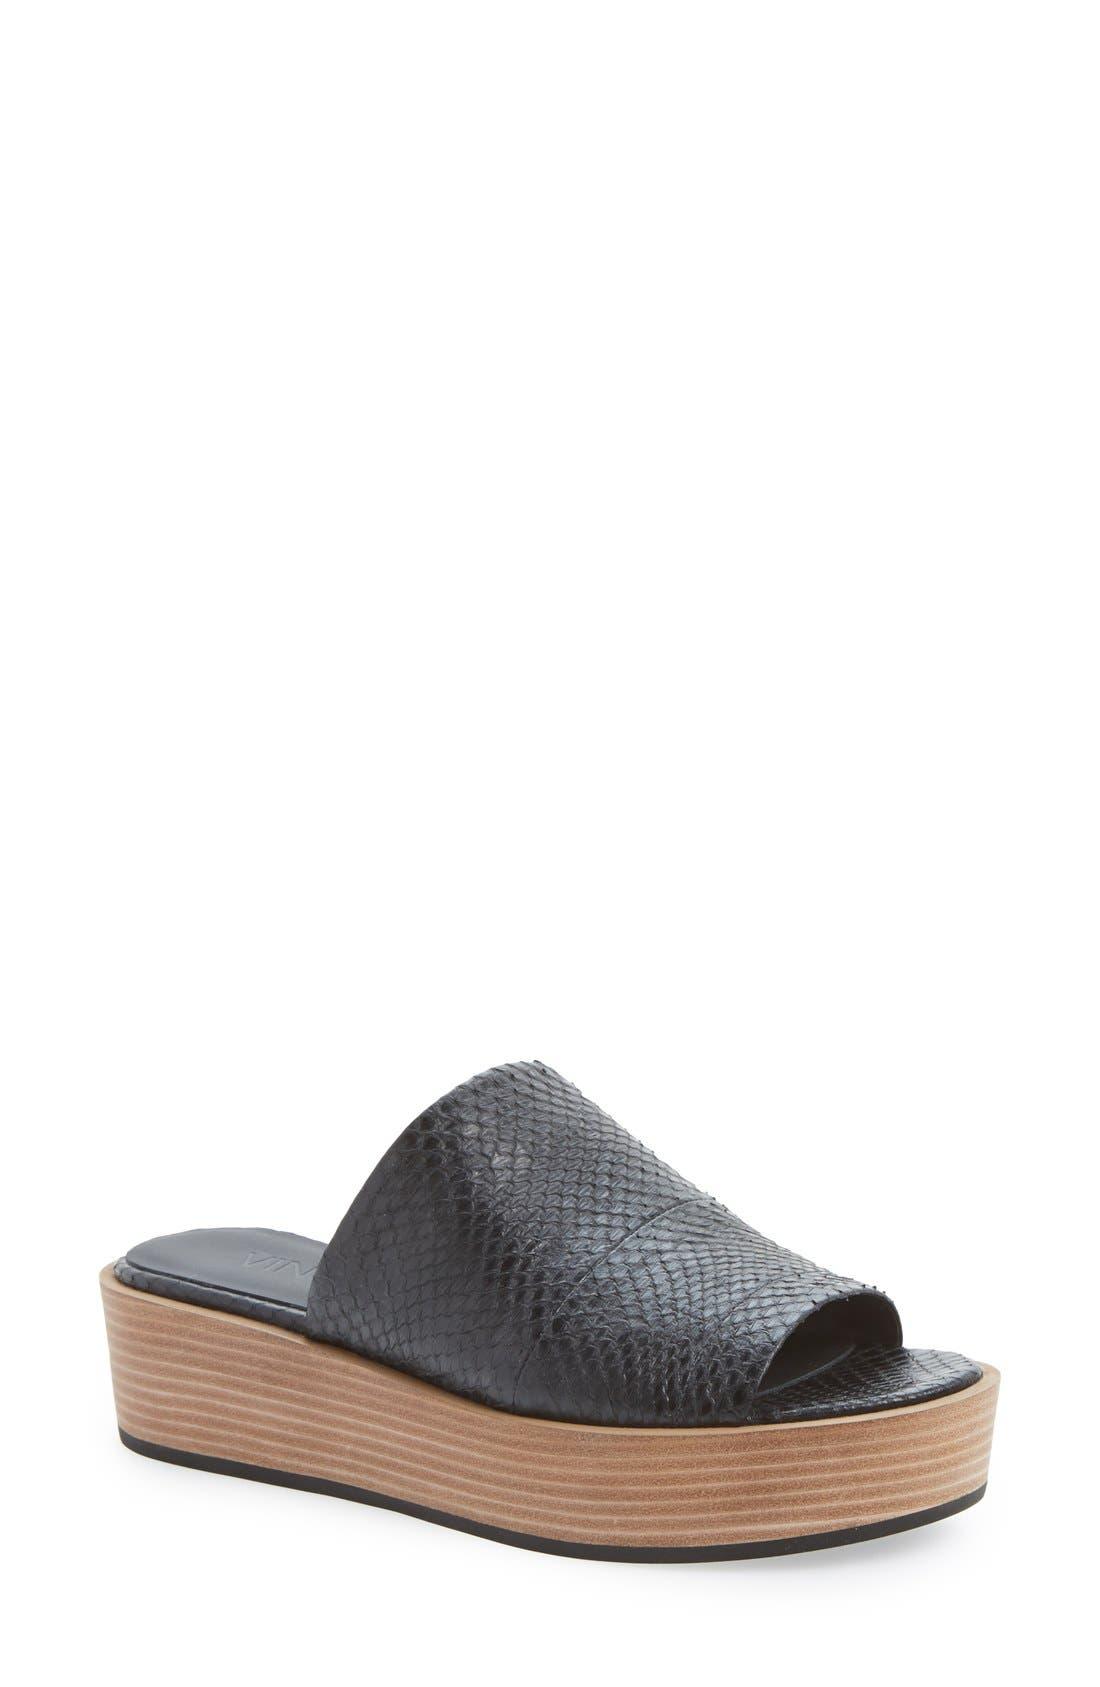 Main Image - Vince 'Saskia 2' Platform Sandal (Women)